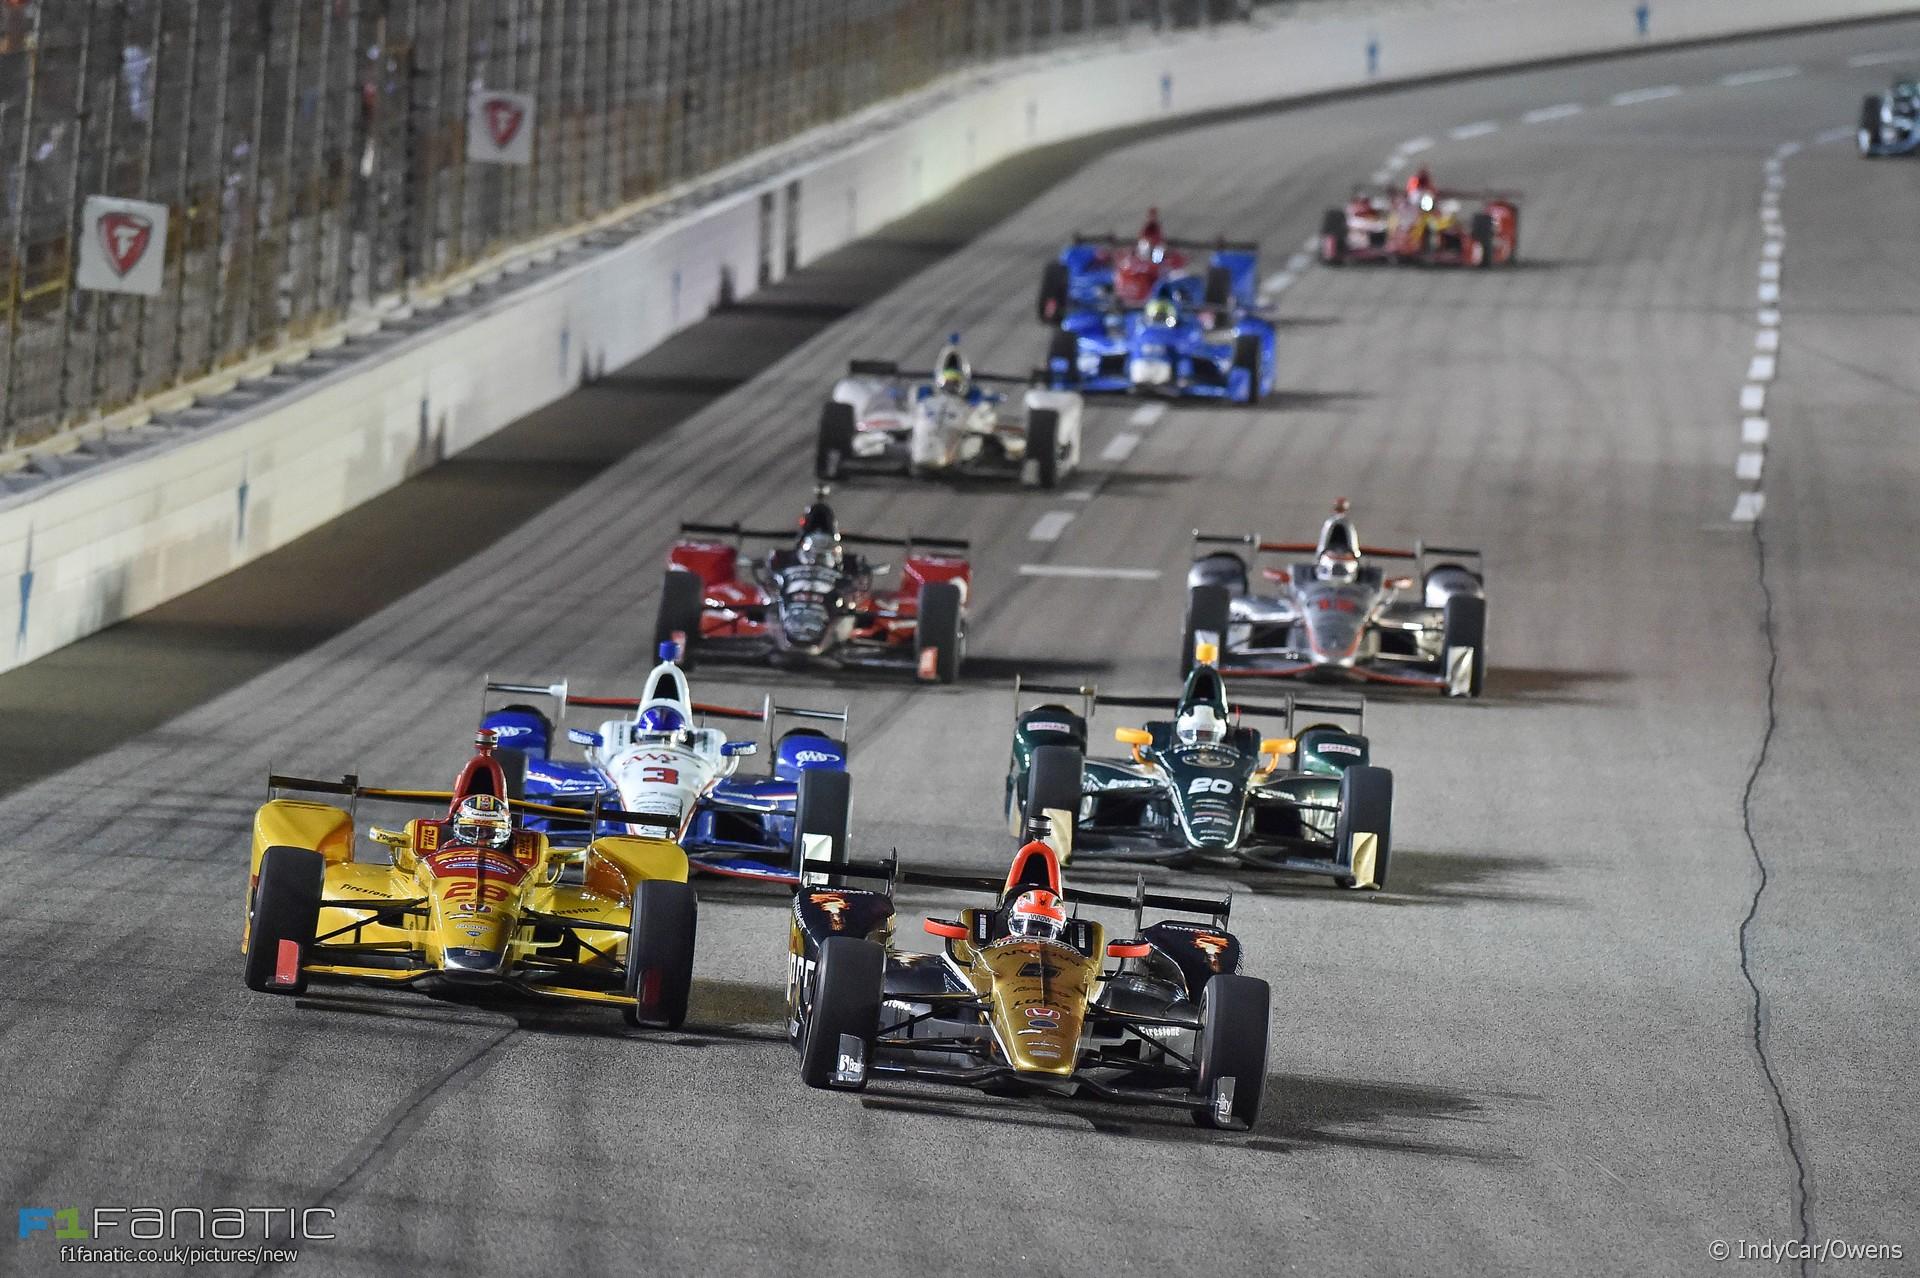 IndyCar, Texas Motor Speedway, 2016